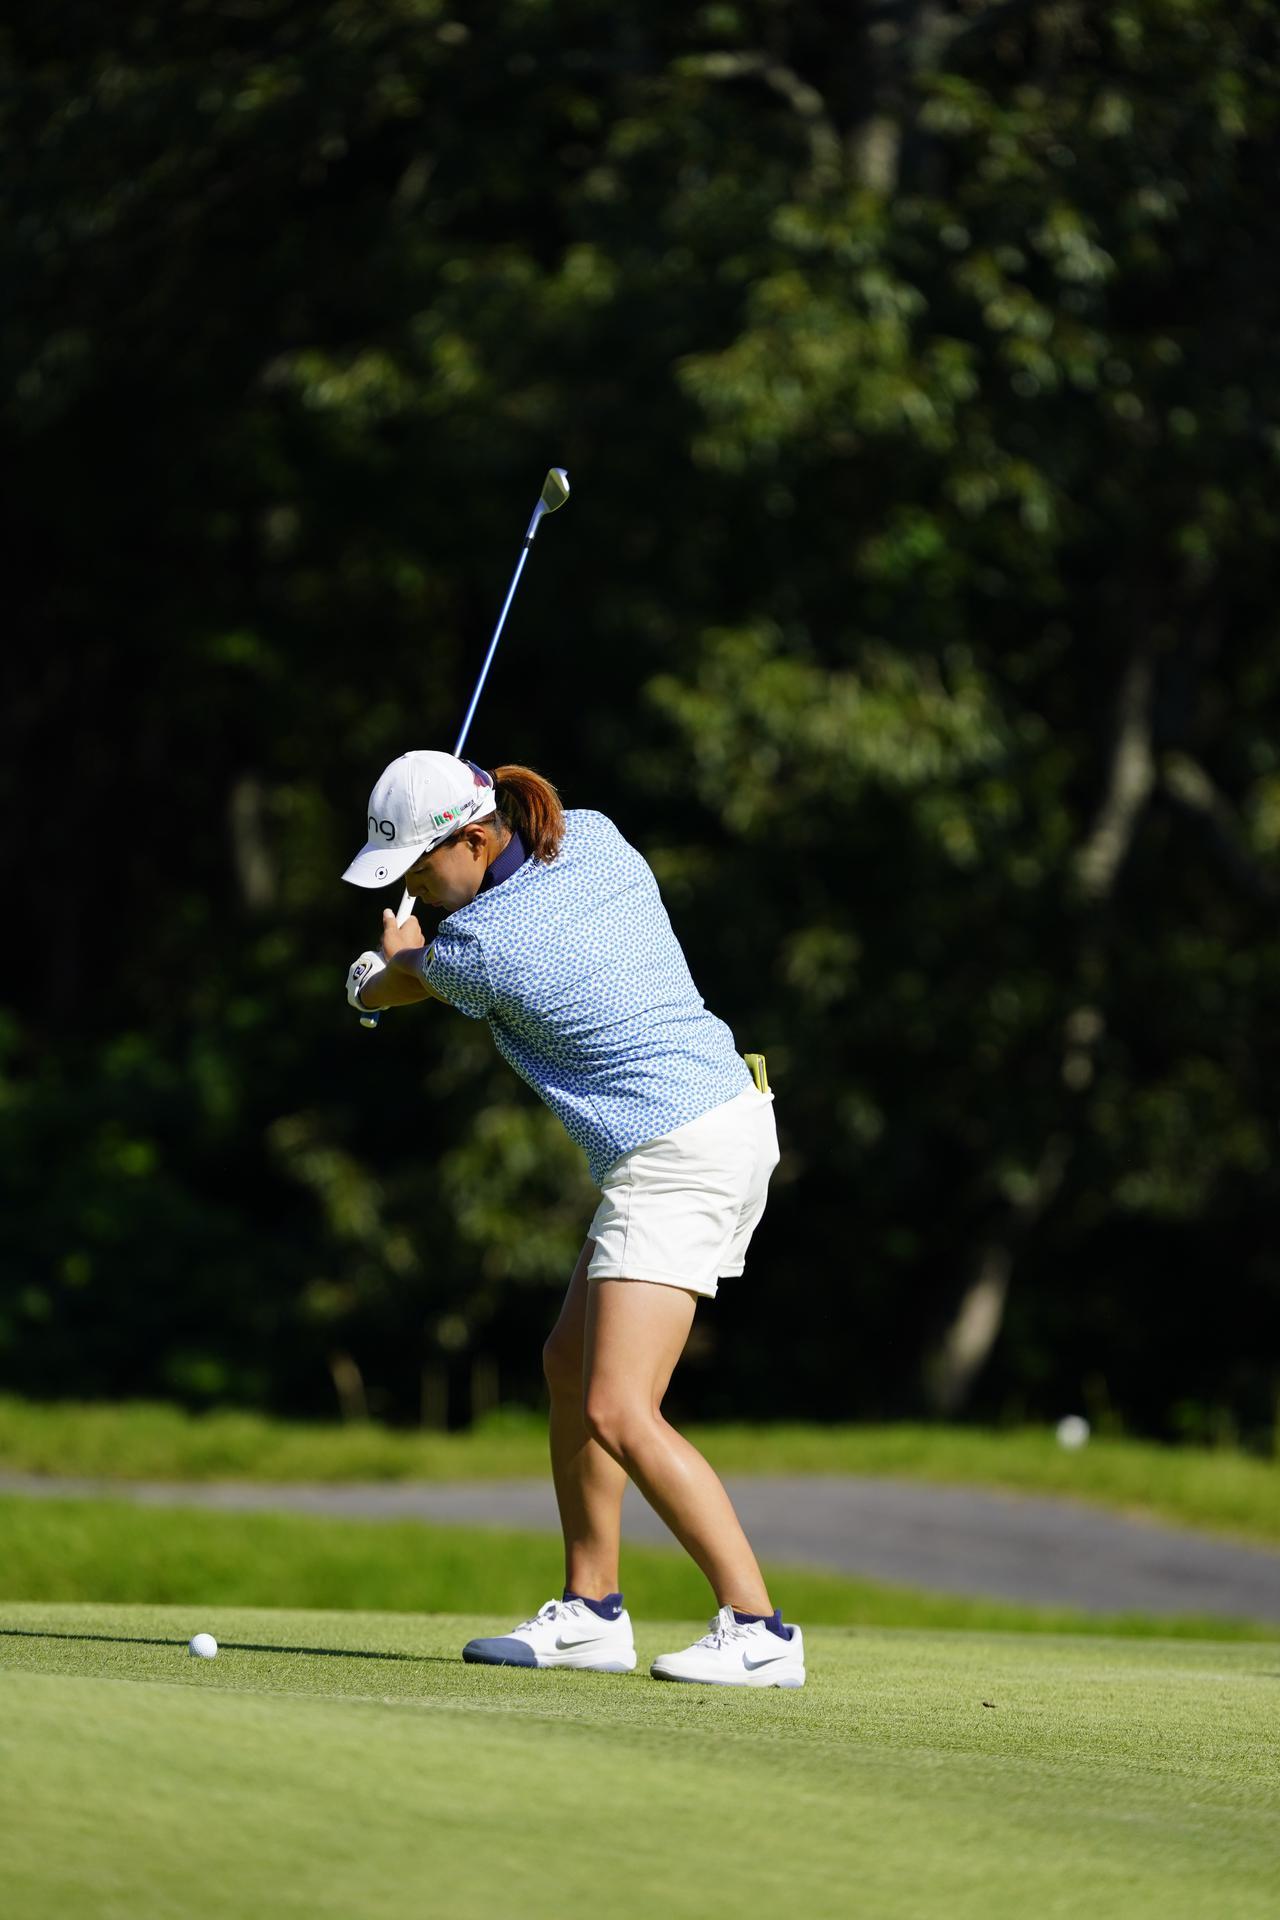 Images : 5番目の画像 - 渋野日向子 アイアン連続写真 - みんなのゴルフダイジェスト